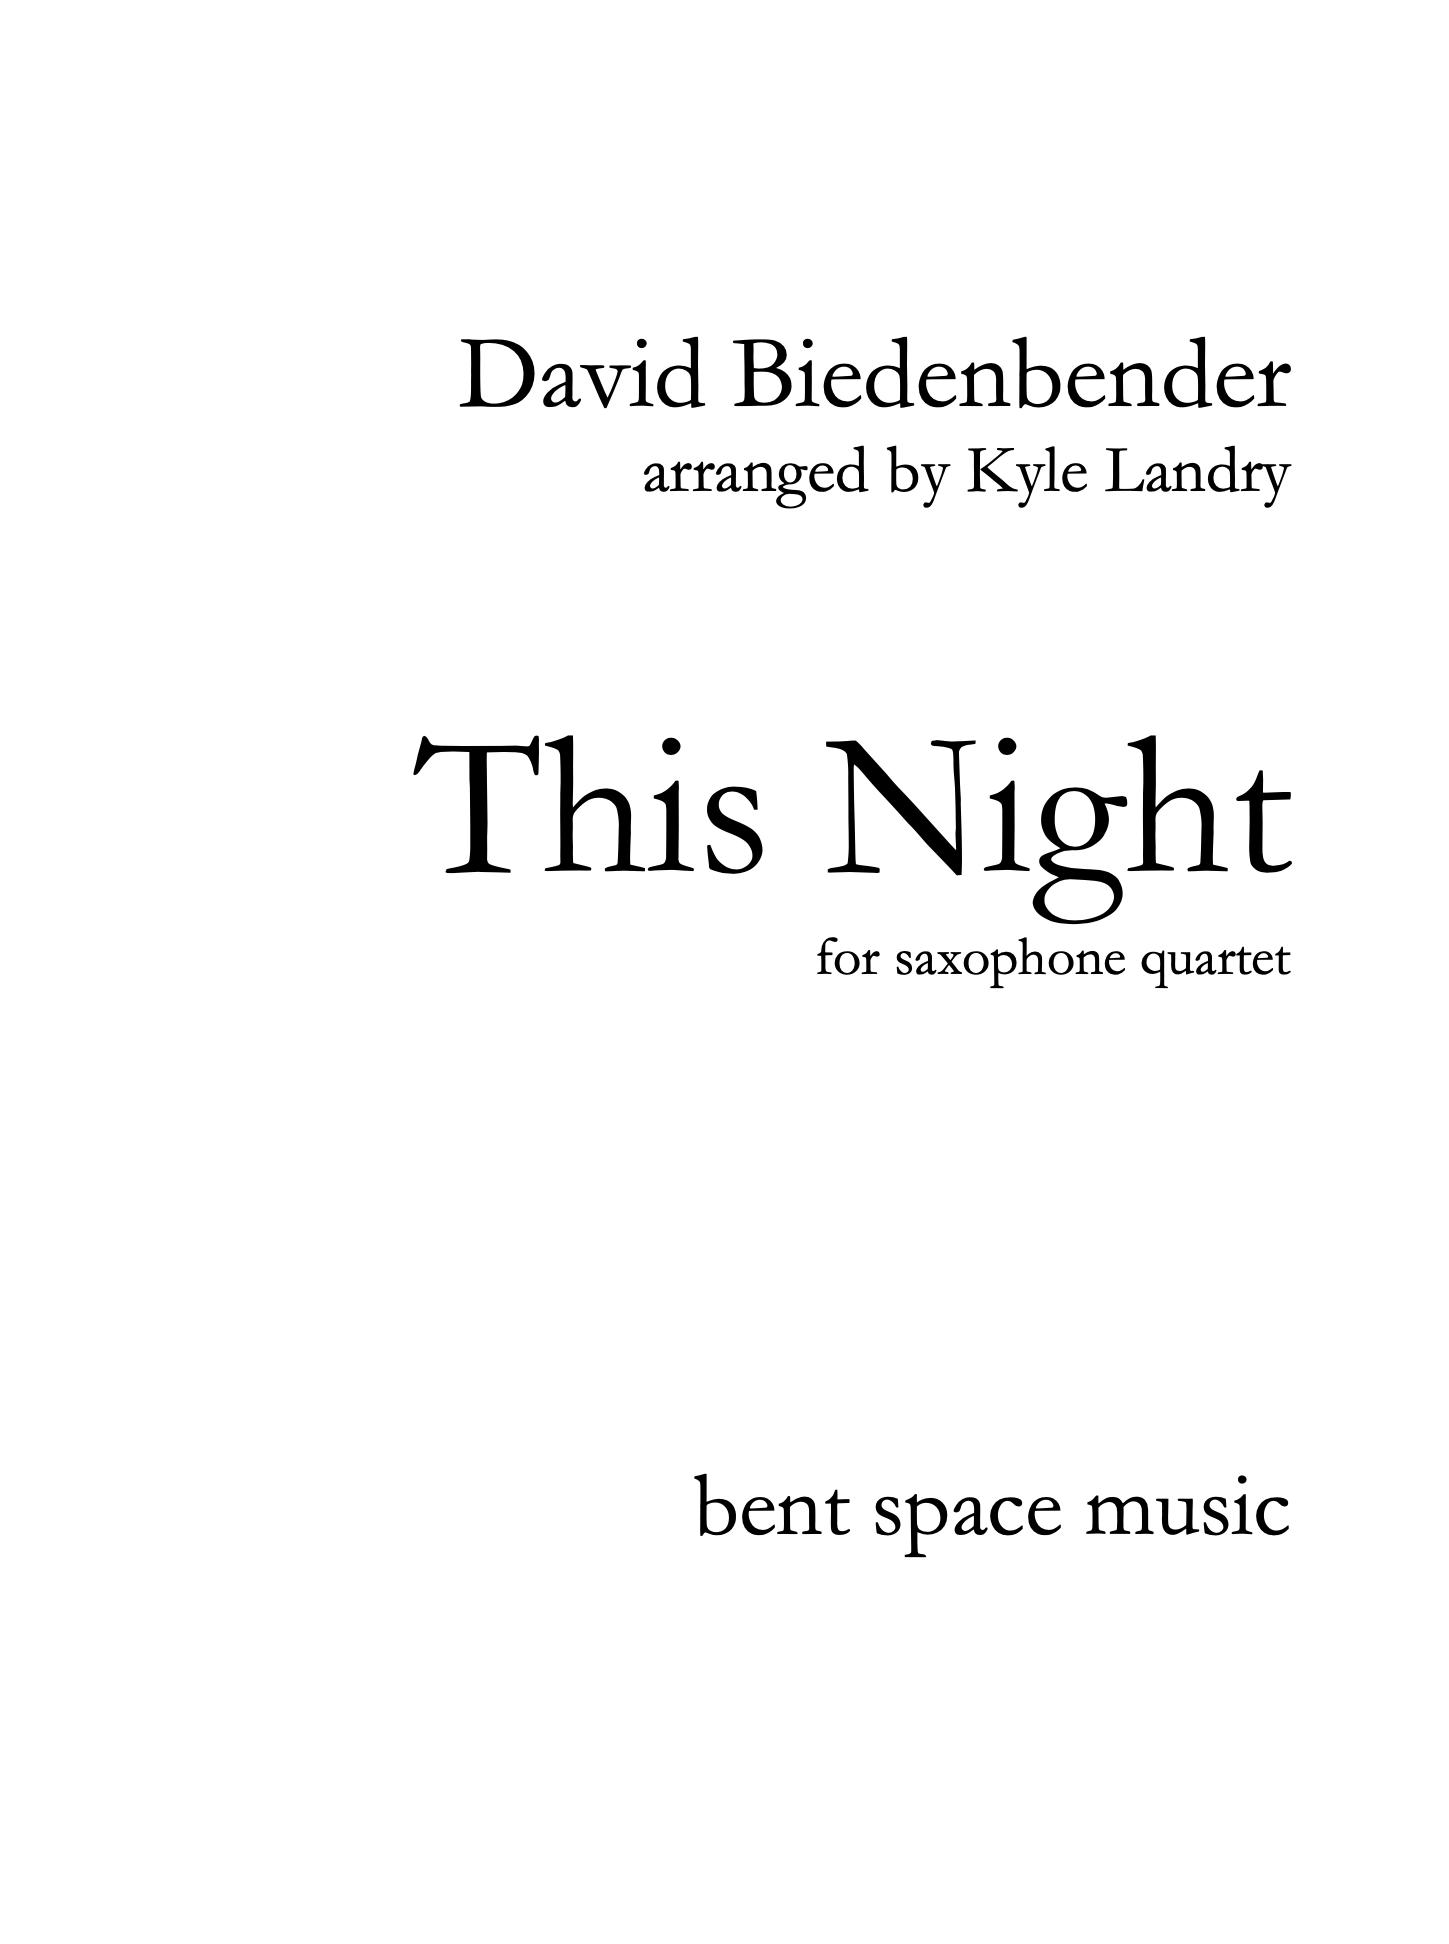 This Night (Quartet Version) by David Biedenbender, arr. Kyle Landry